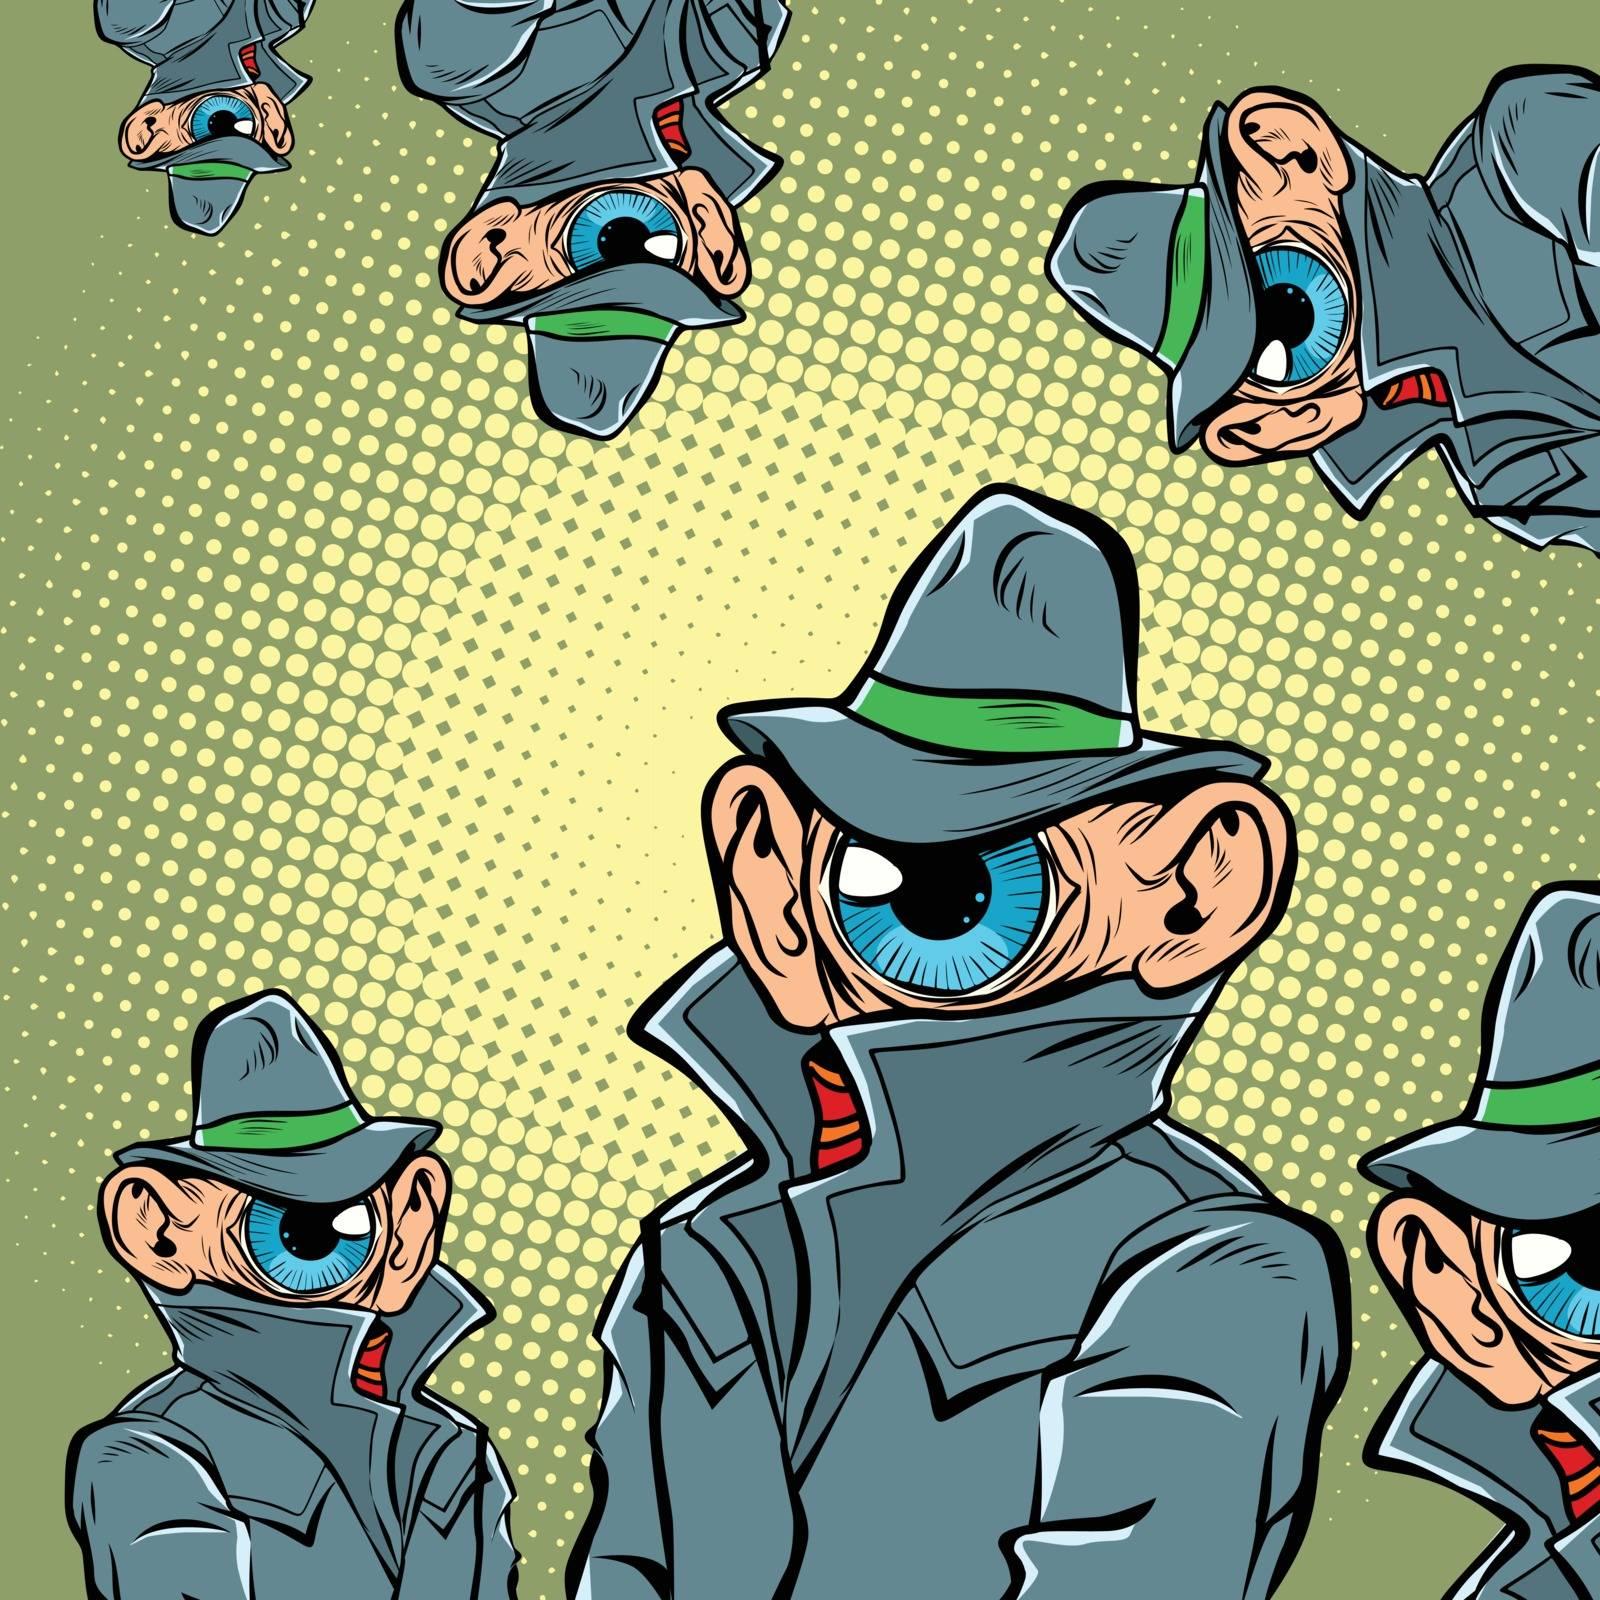 spy eye surveillance. Comic cartoon pop art retro vector illustration hand drawing